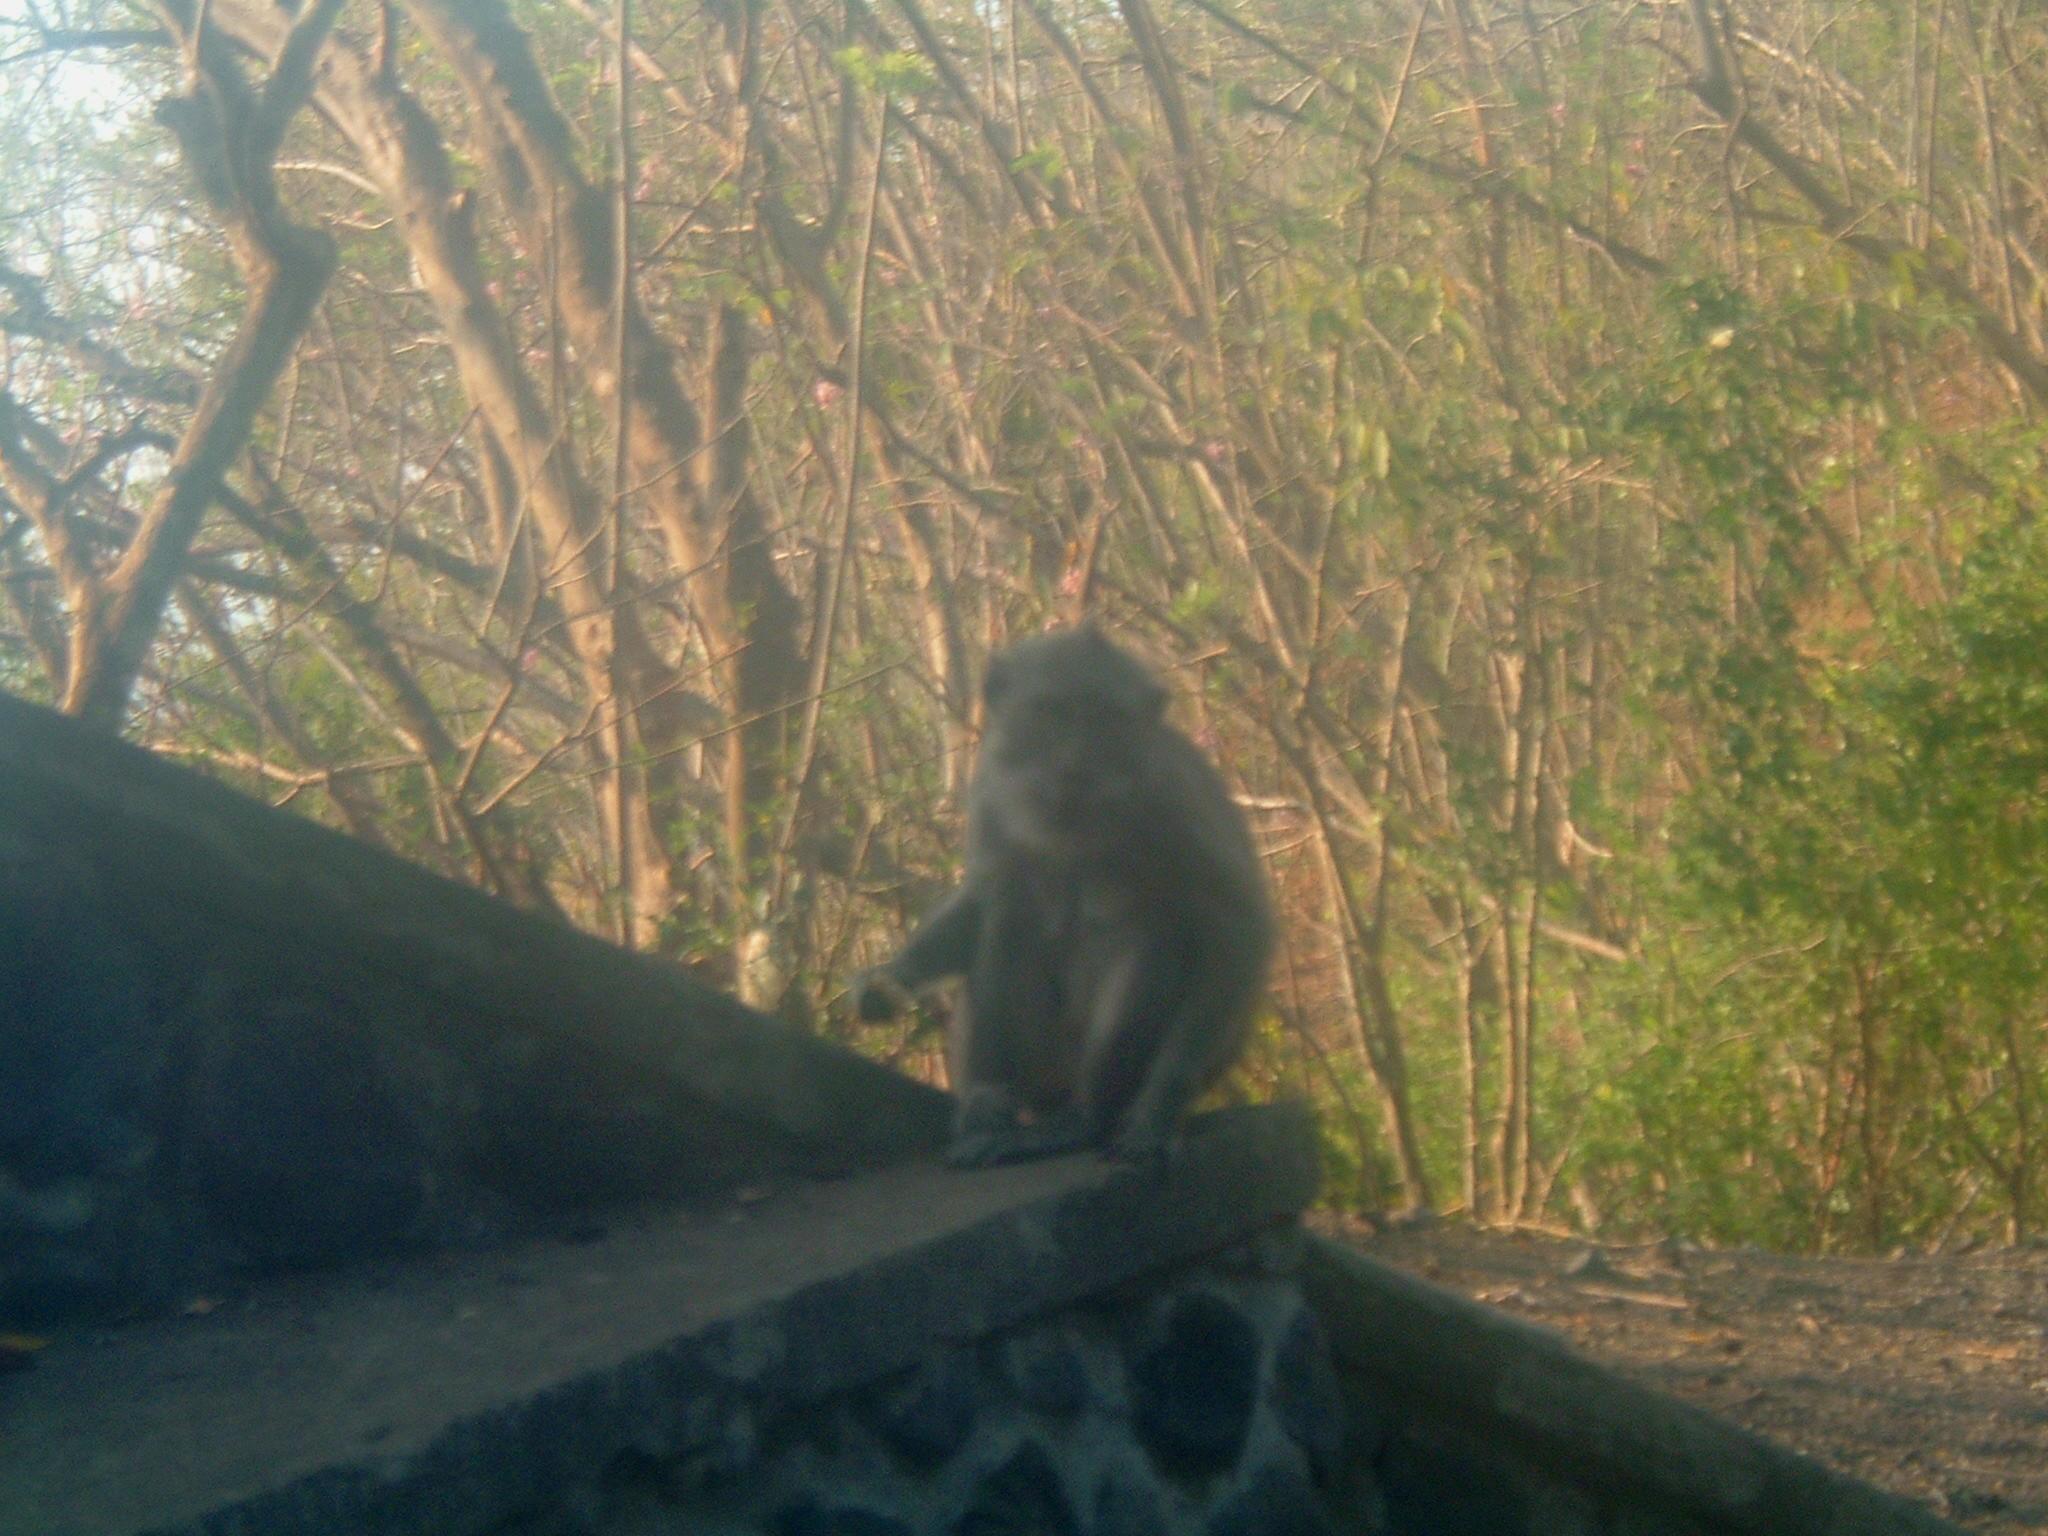 temple monkey near candidasa.JPG